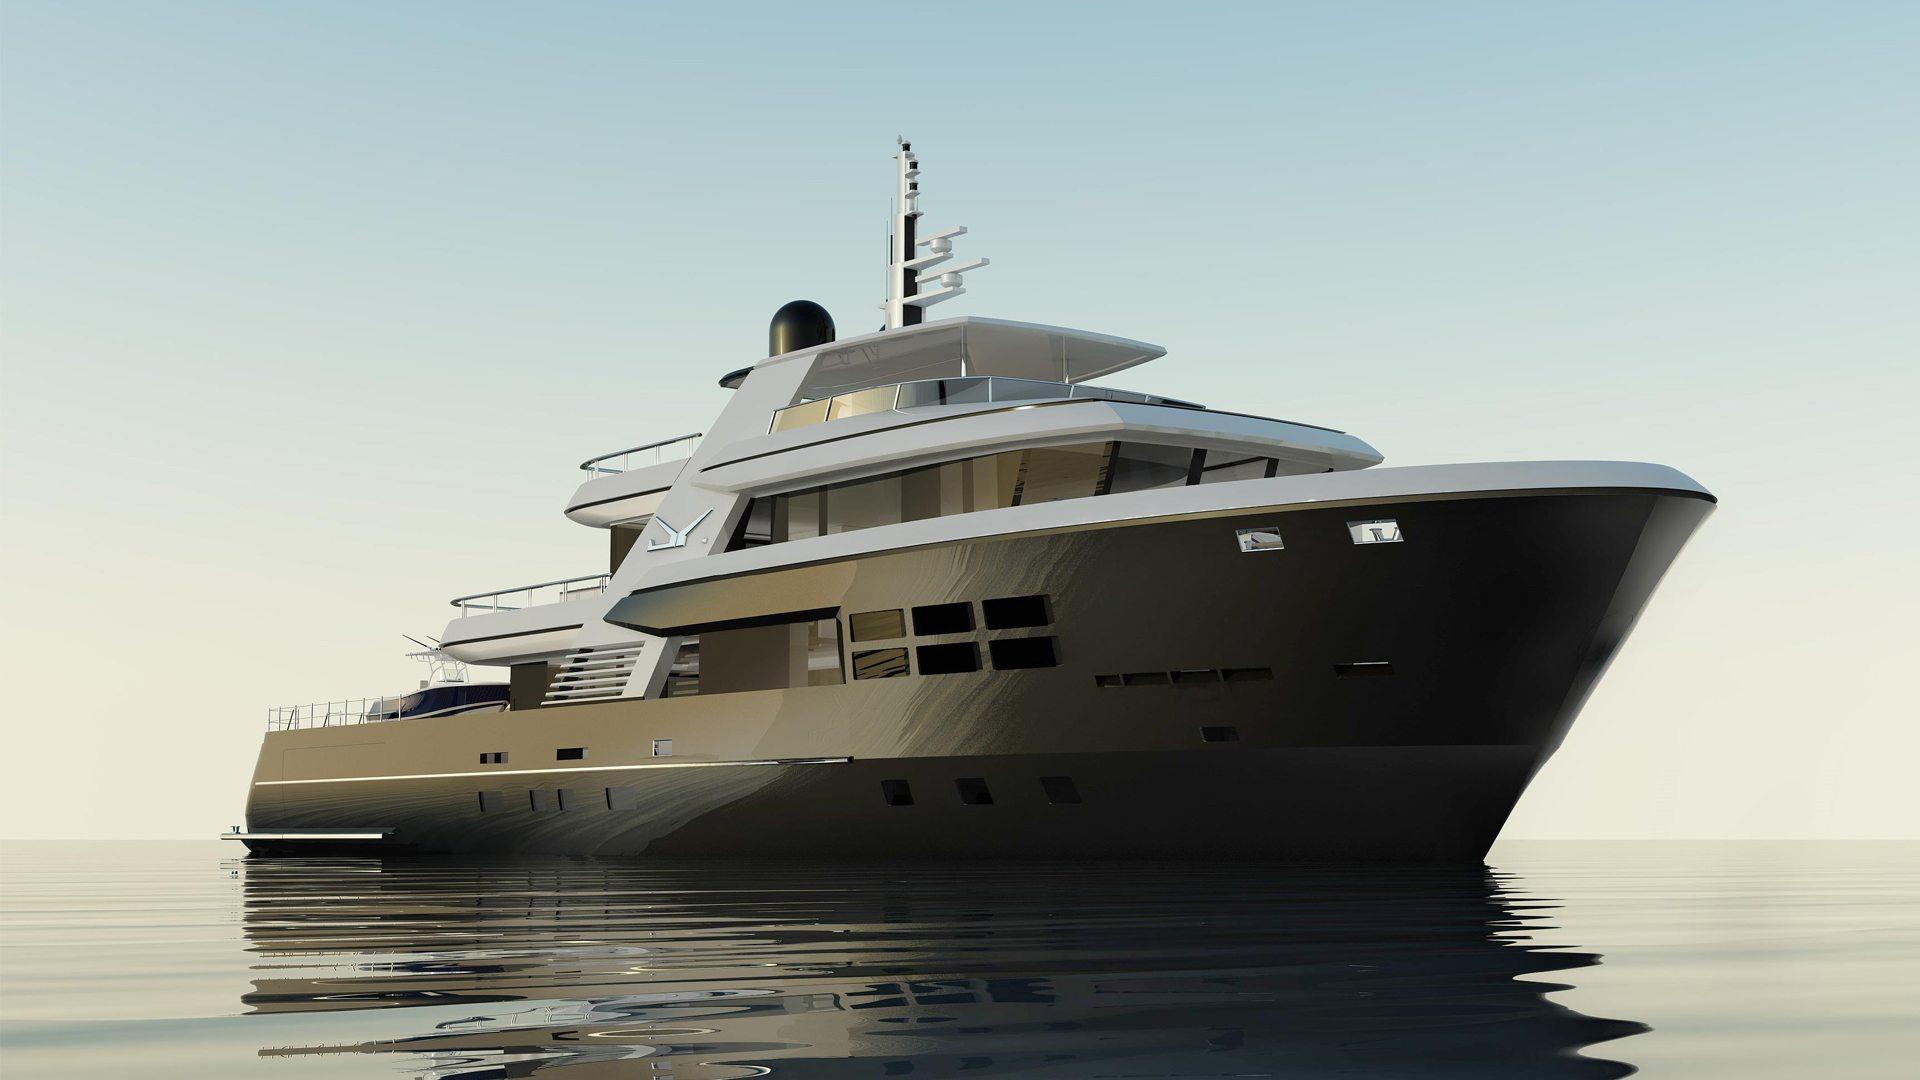 Bandido 148 - Bandido Yachts by Drettmann - Drettmann Yachts